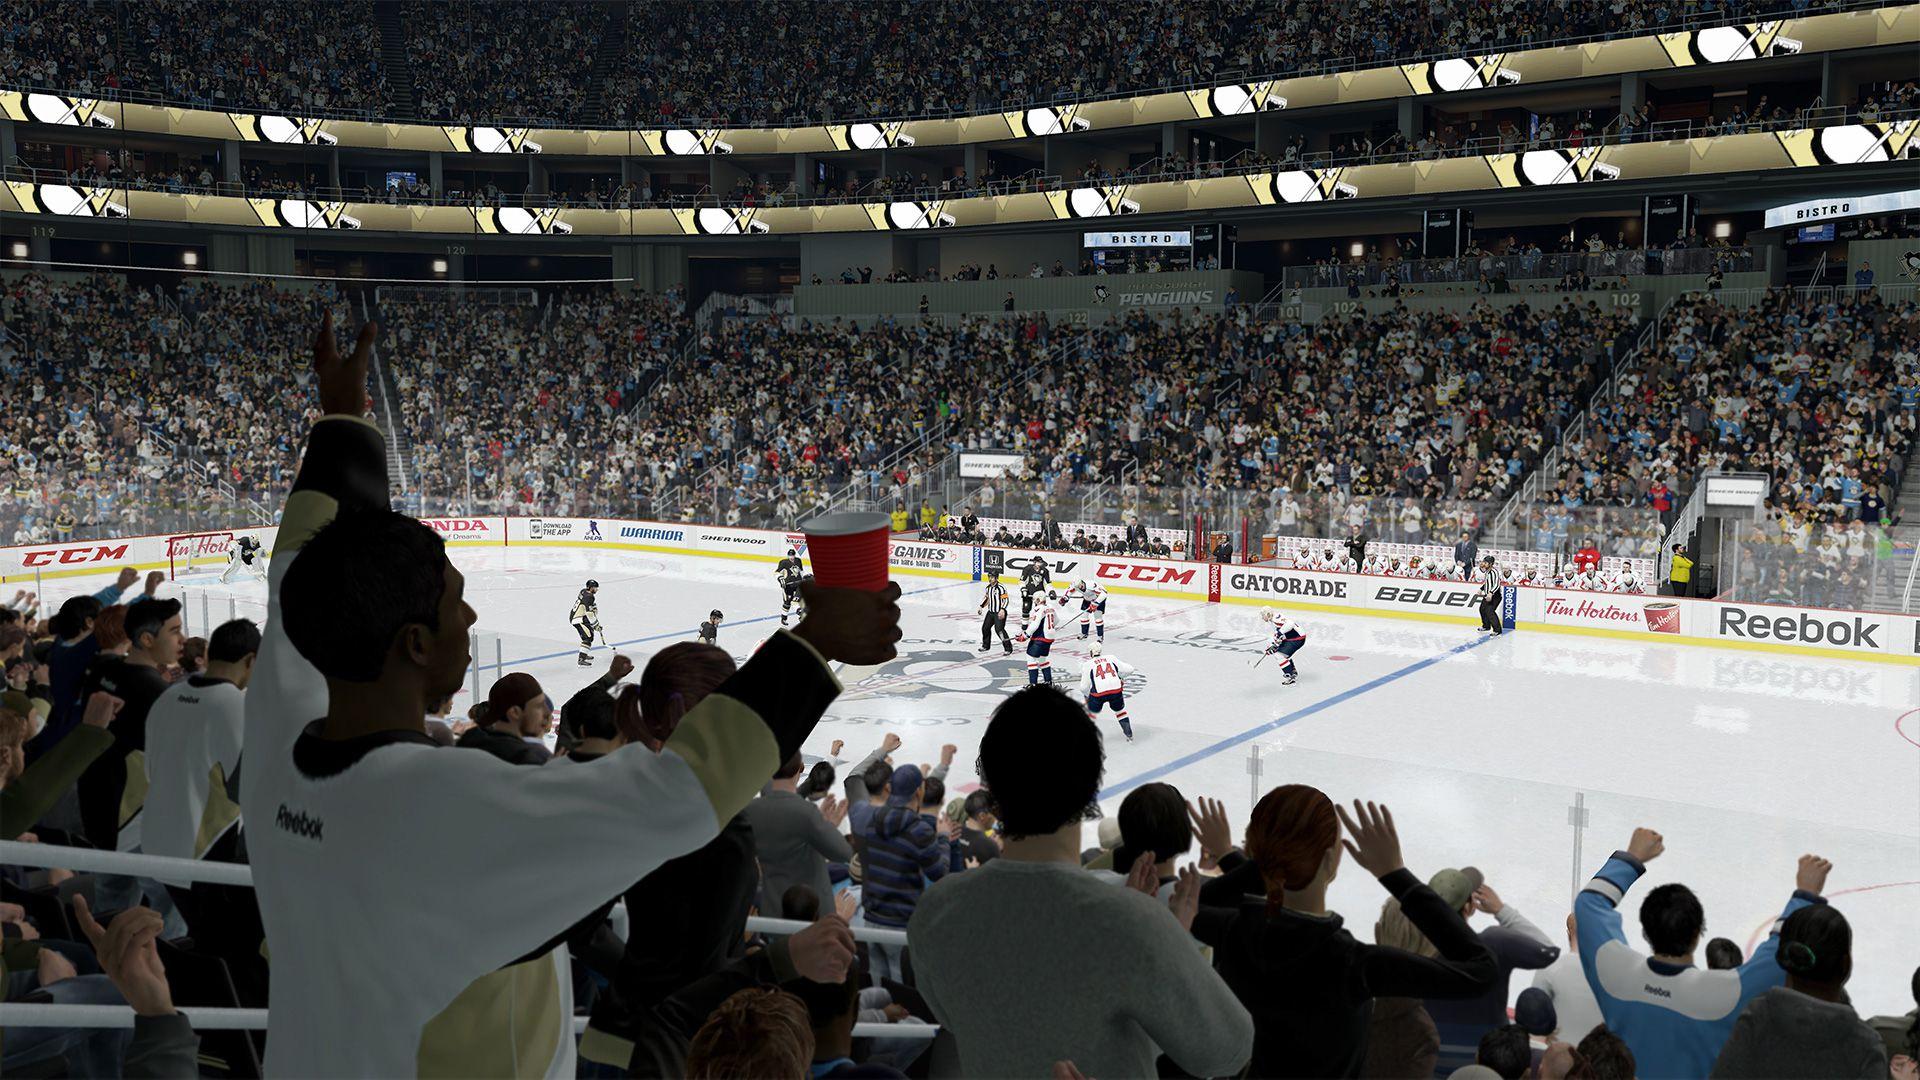 NHL 16 - WAS / PIT screenshot 1920